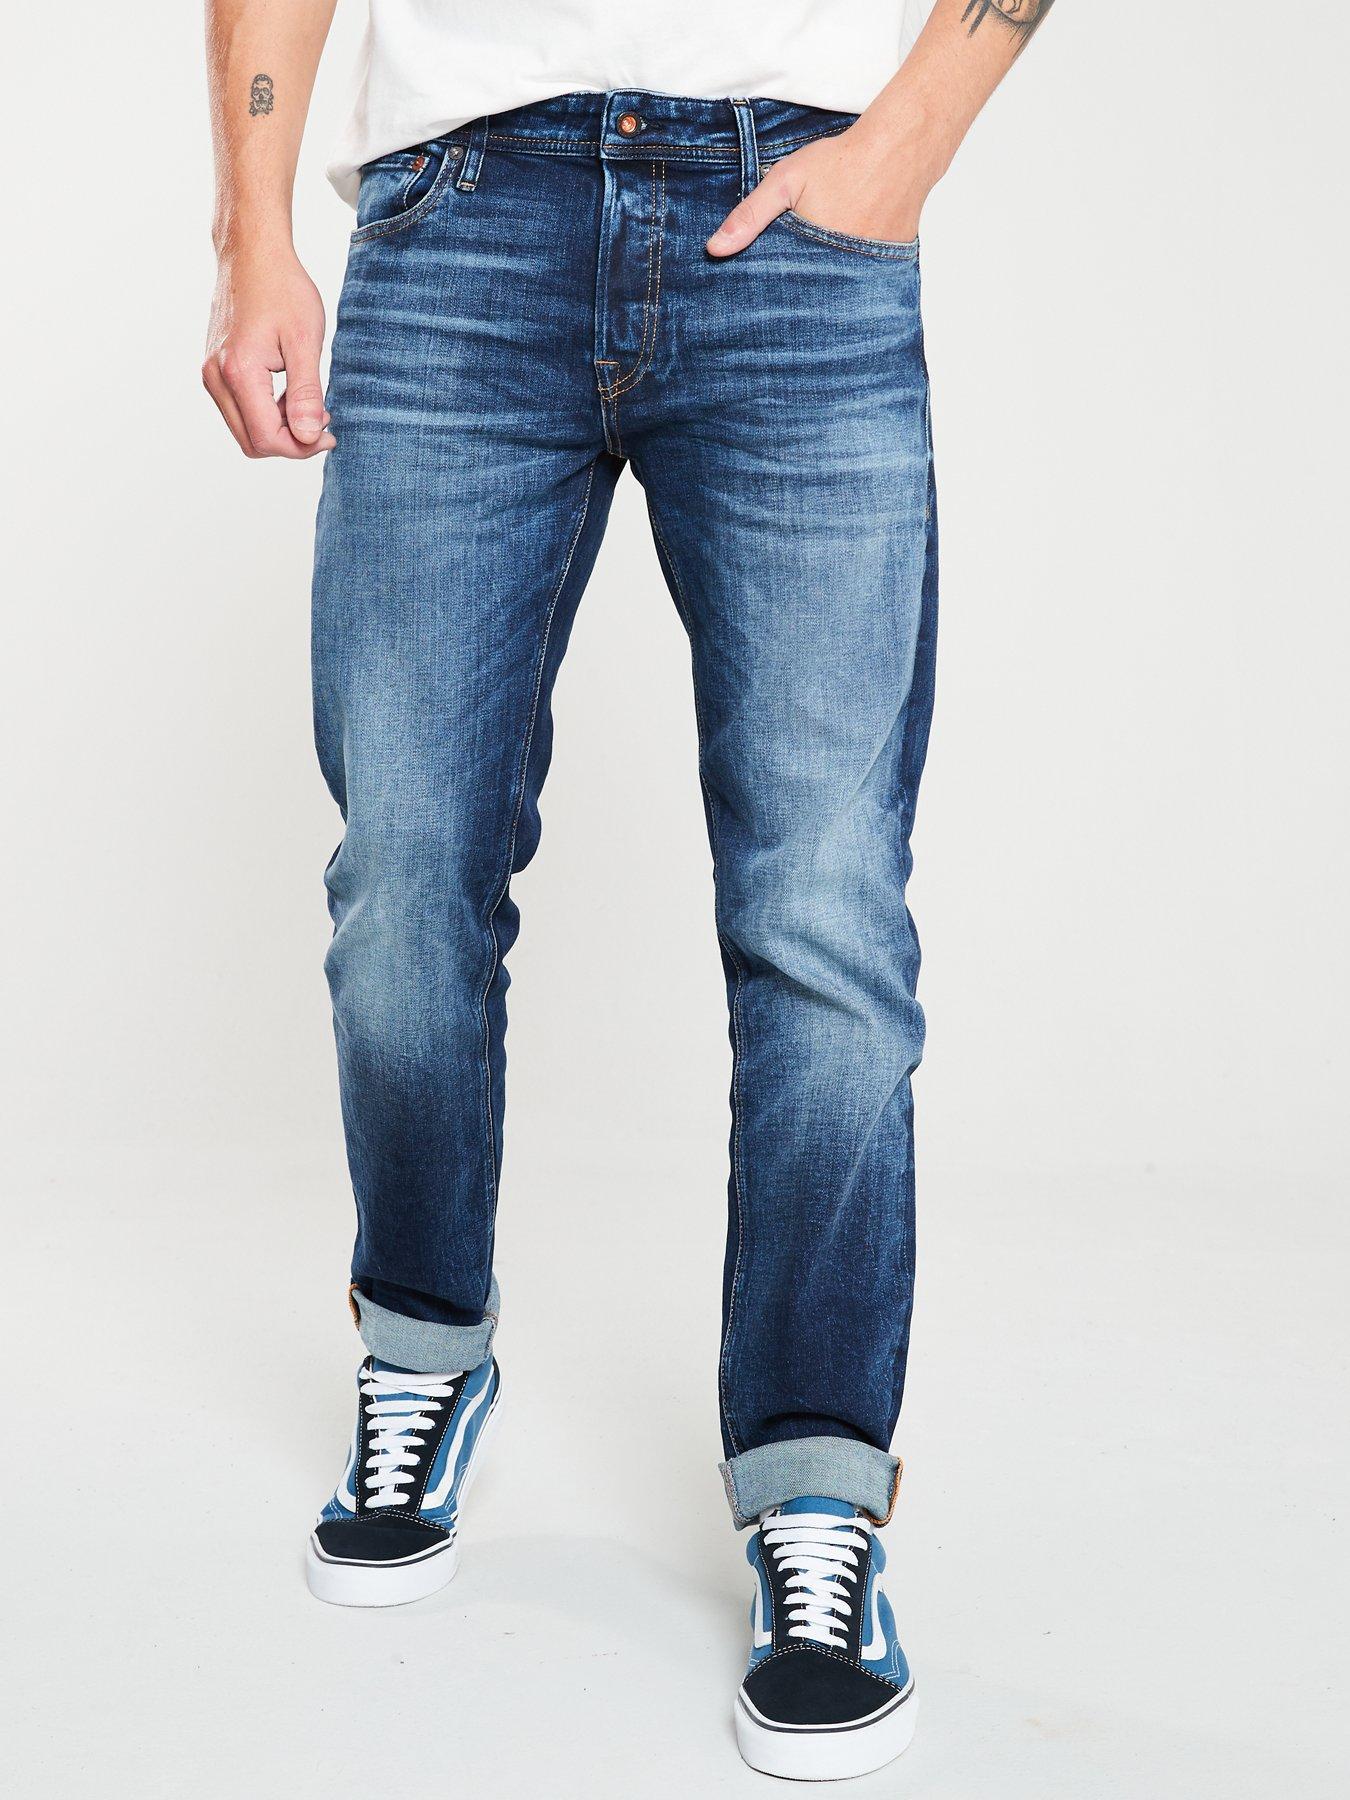 Jack and Jones Mike Original Jeans in Blue Denim